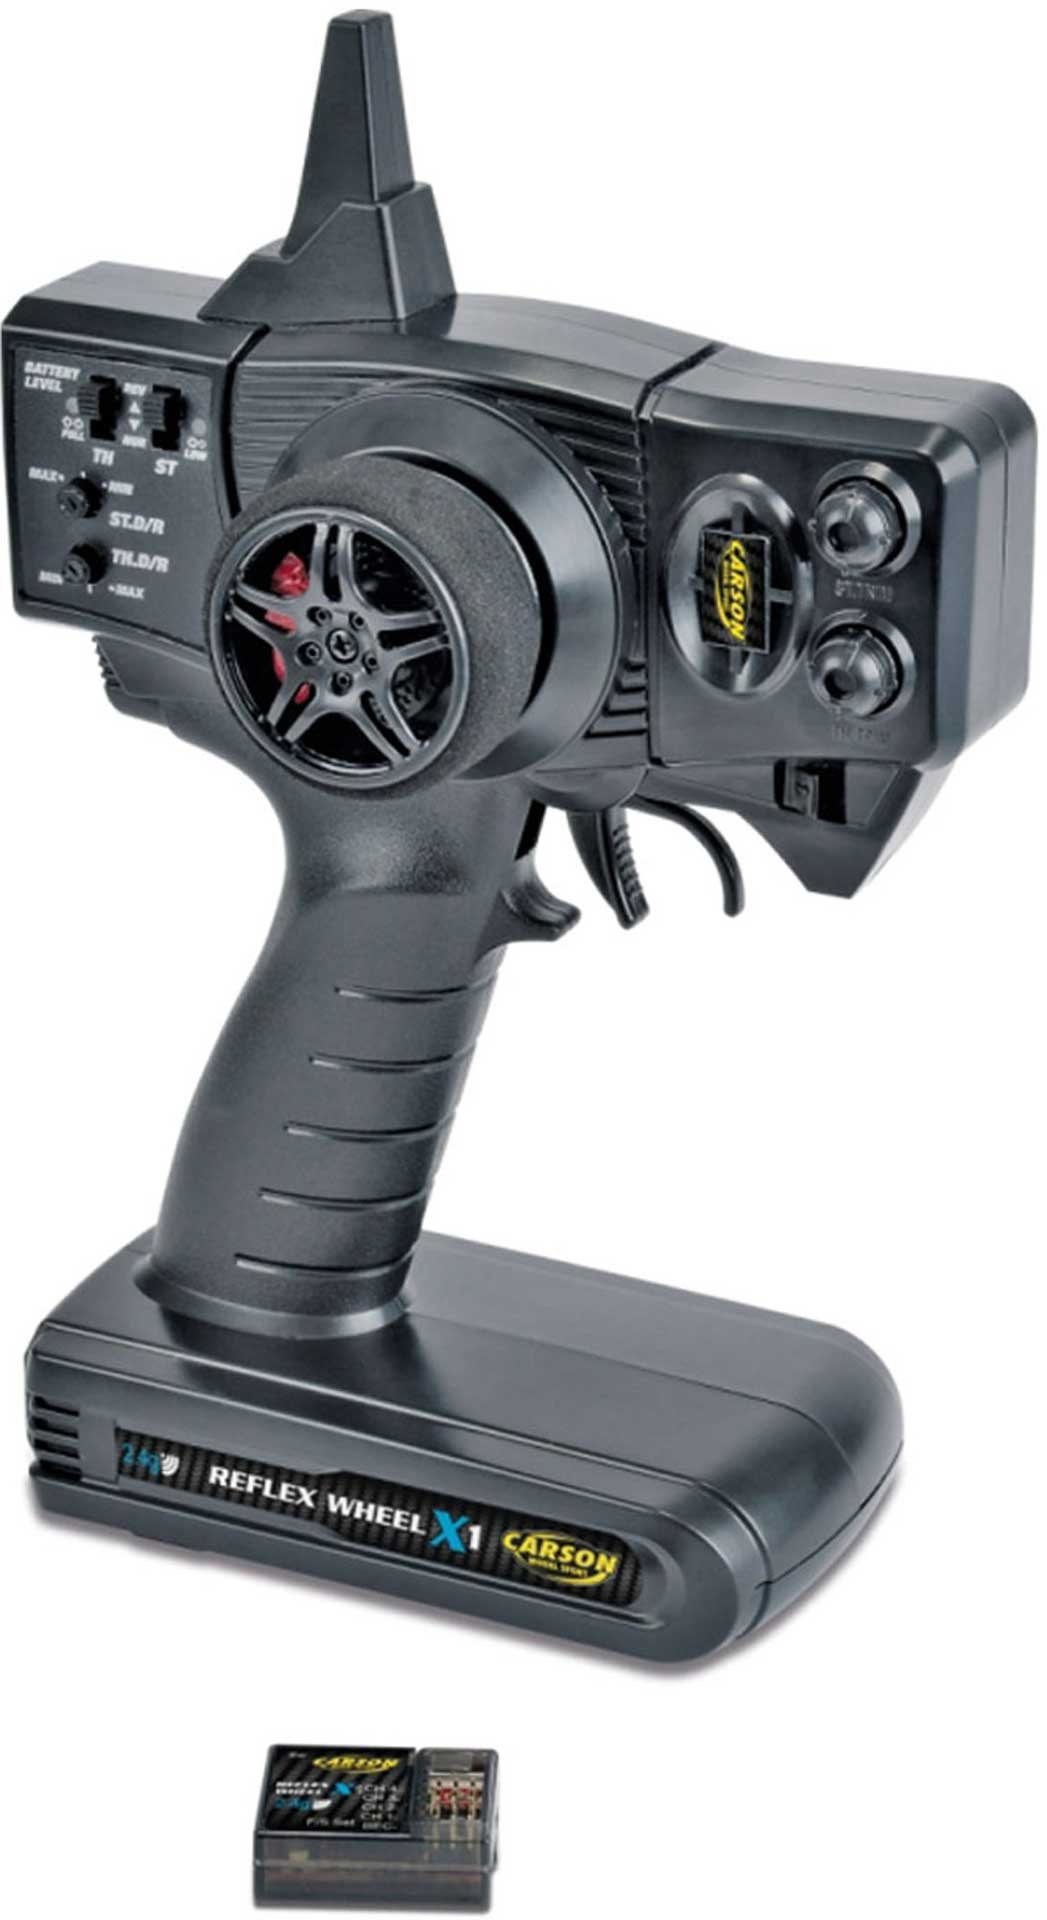 CARSON Reflex x1 2-channel 2,4GHZ remotecontrol